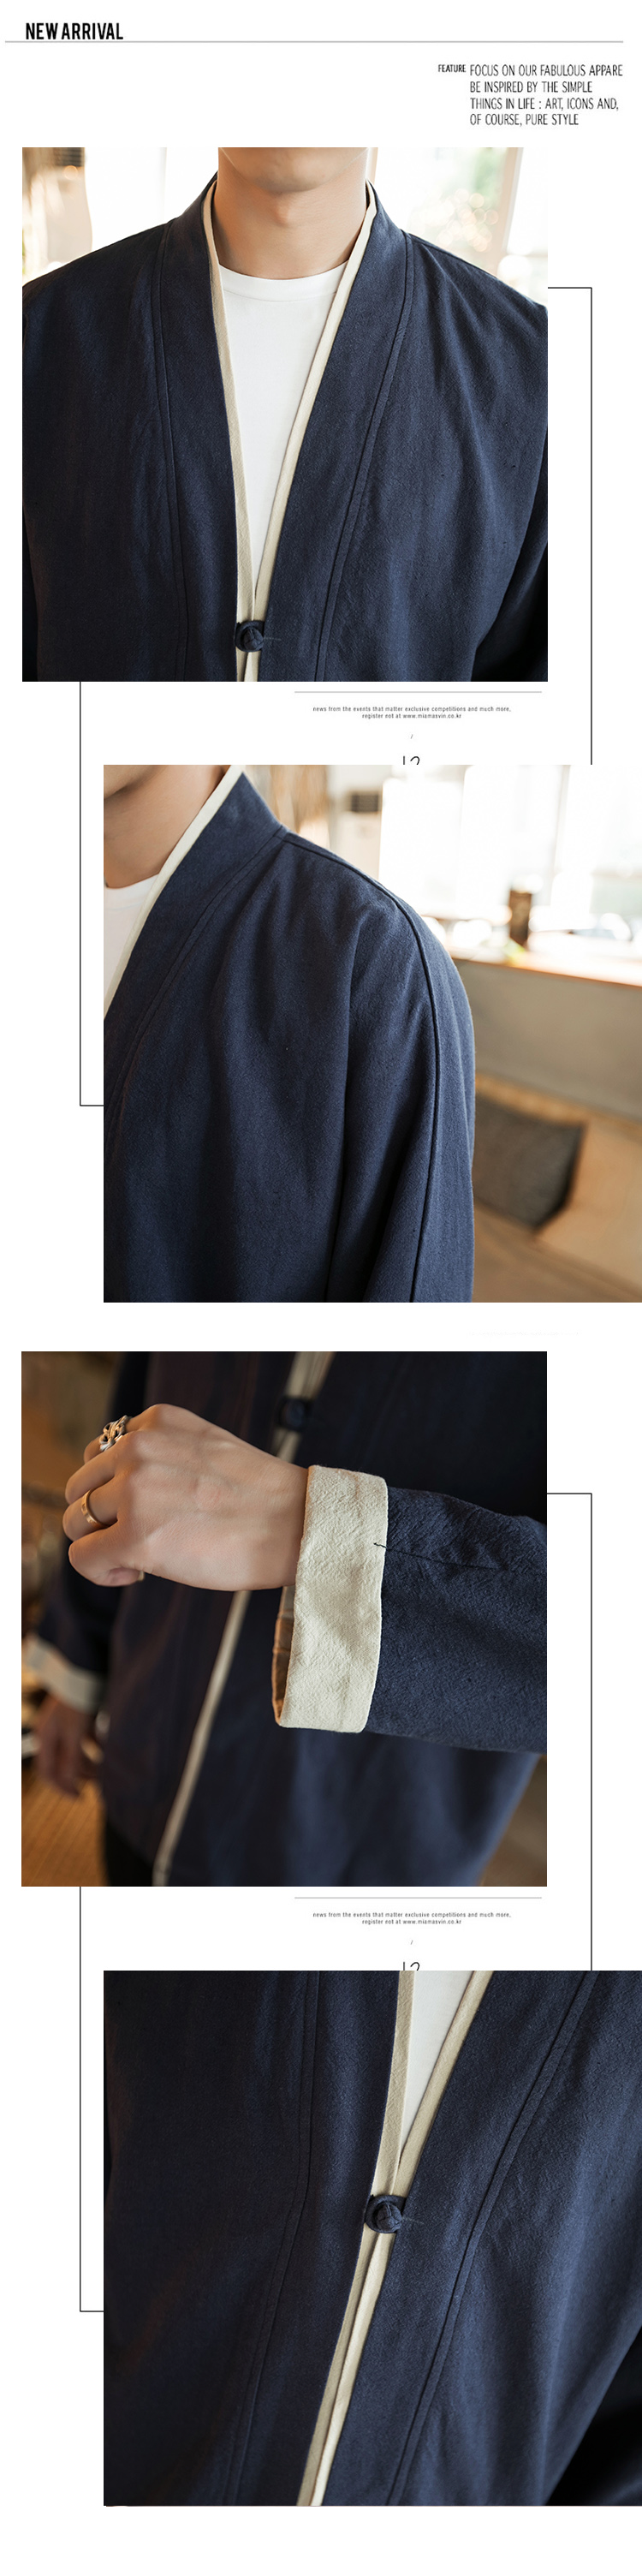 Sinicism Store Men Patchwork Shirt Streetwear Short Sleeve 19 Summer Harajuku Vintage Kimono Shirts Black Fashion Open Stitch 19